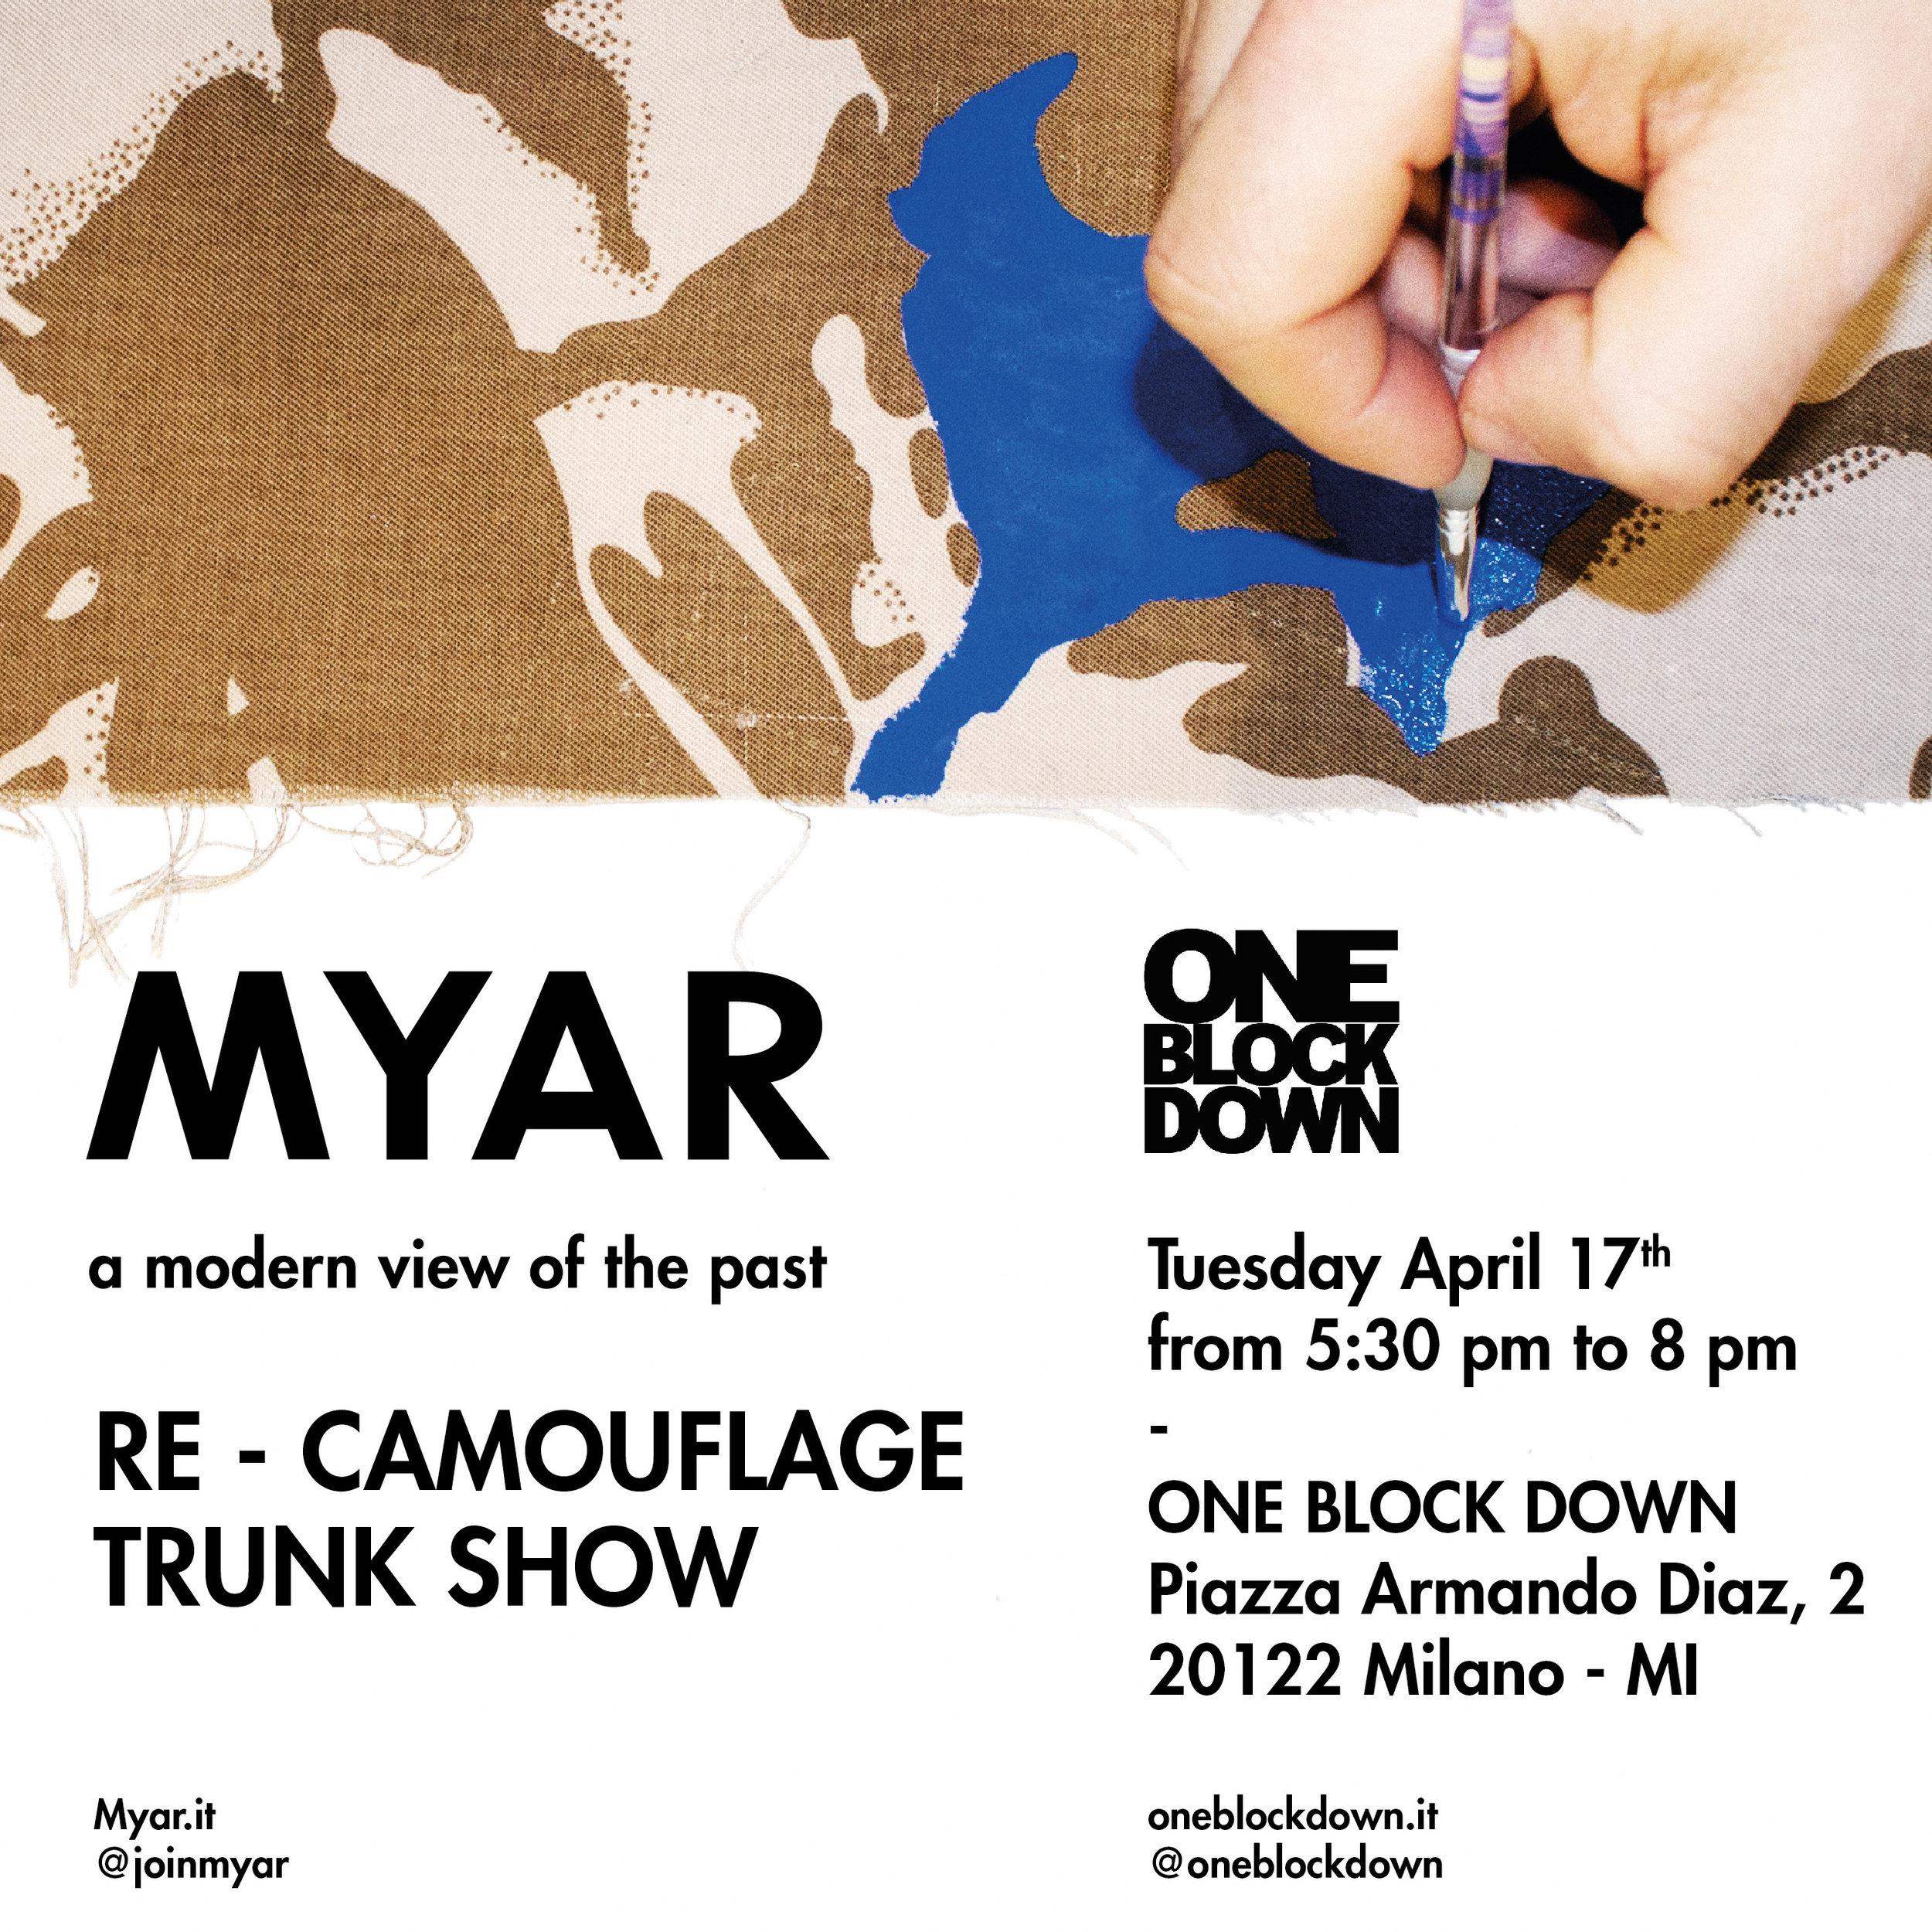 MYAR_ONEBLOCKDOWN_INVITO.jpg